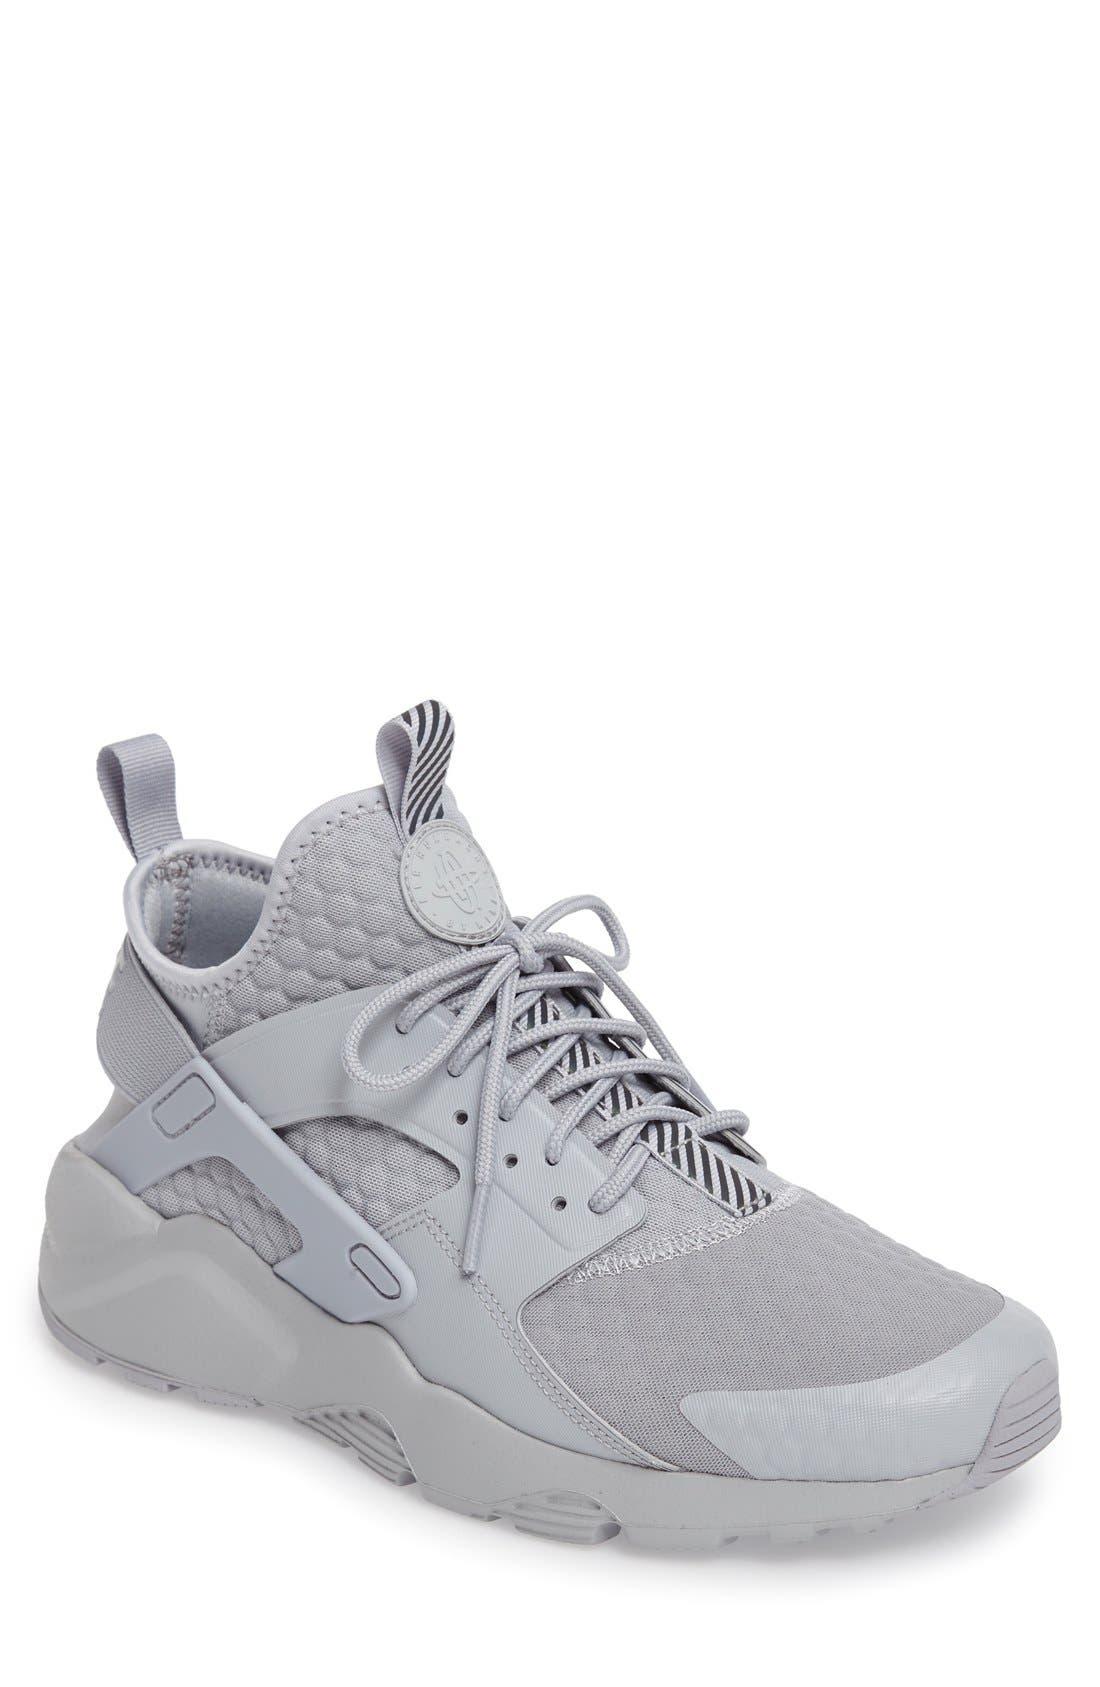 Main Image - Nike Huarache Run Ultra SE Premium Sneaker (Men)